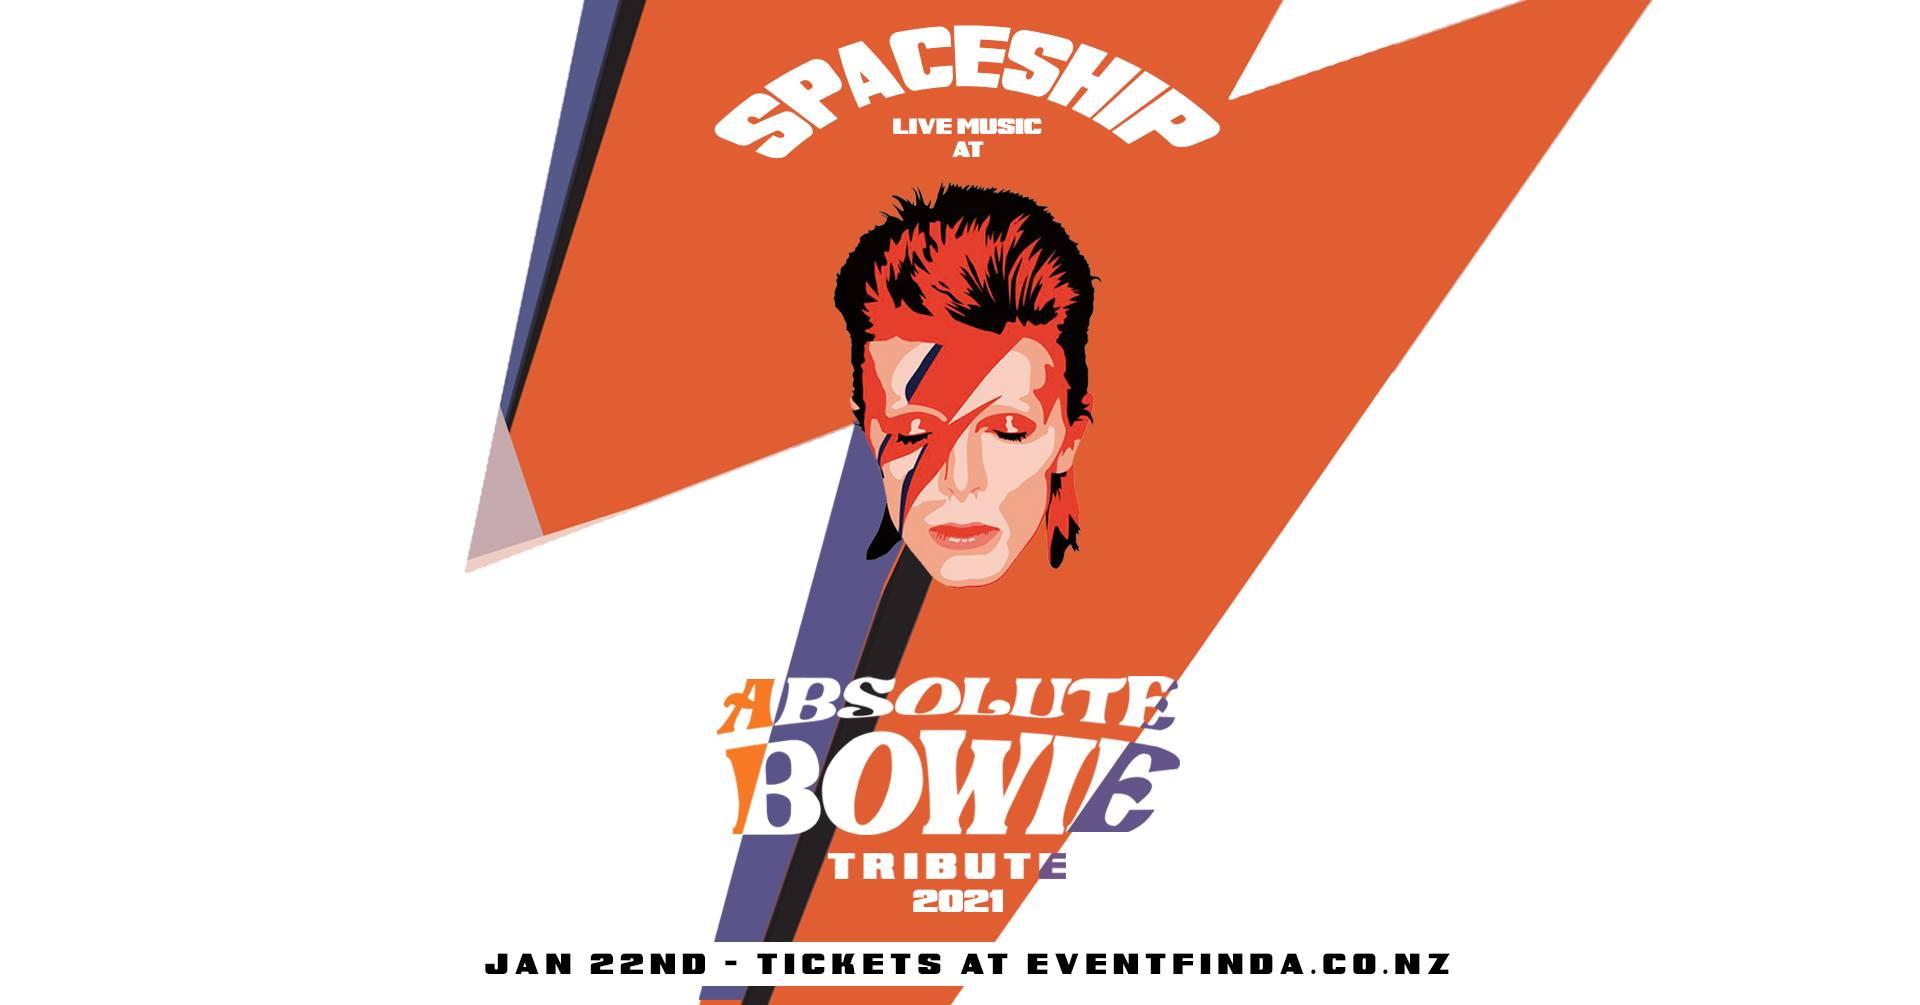 Absolute Bowie Hastings